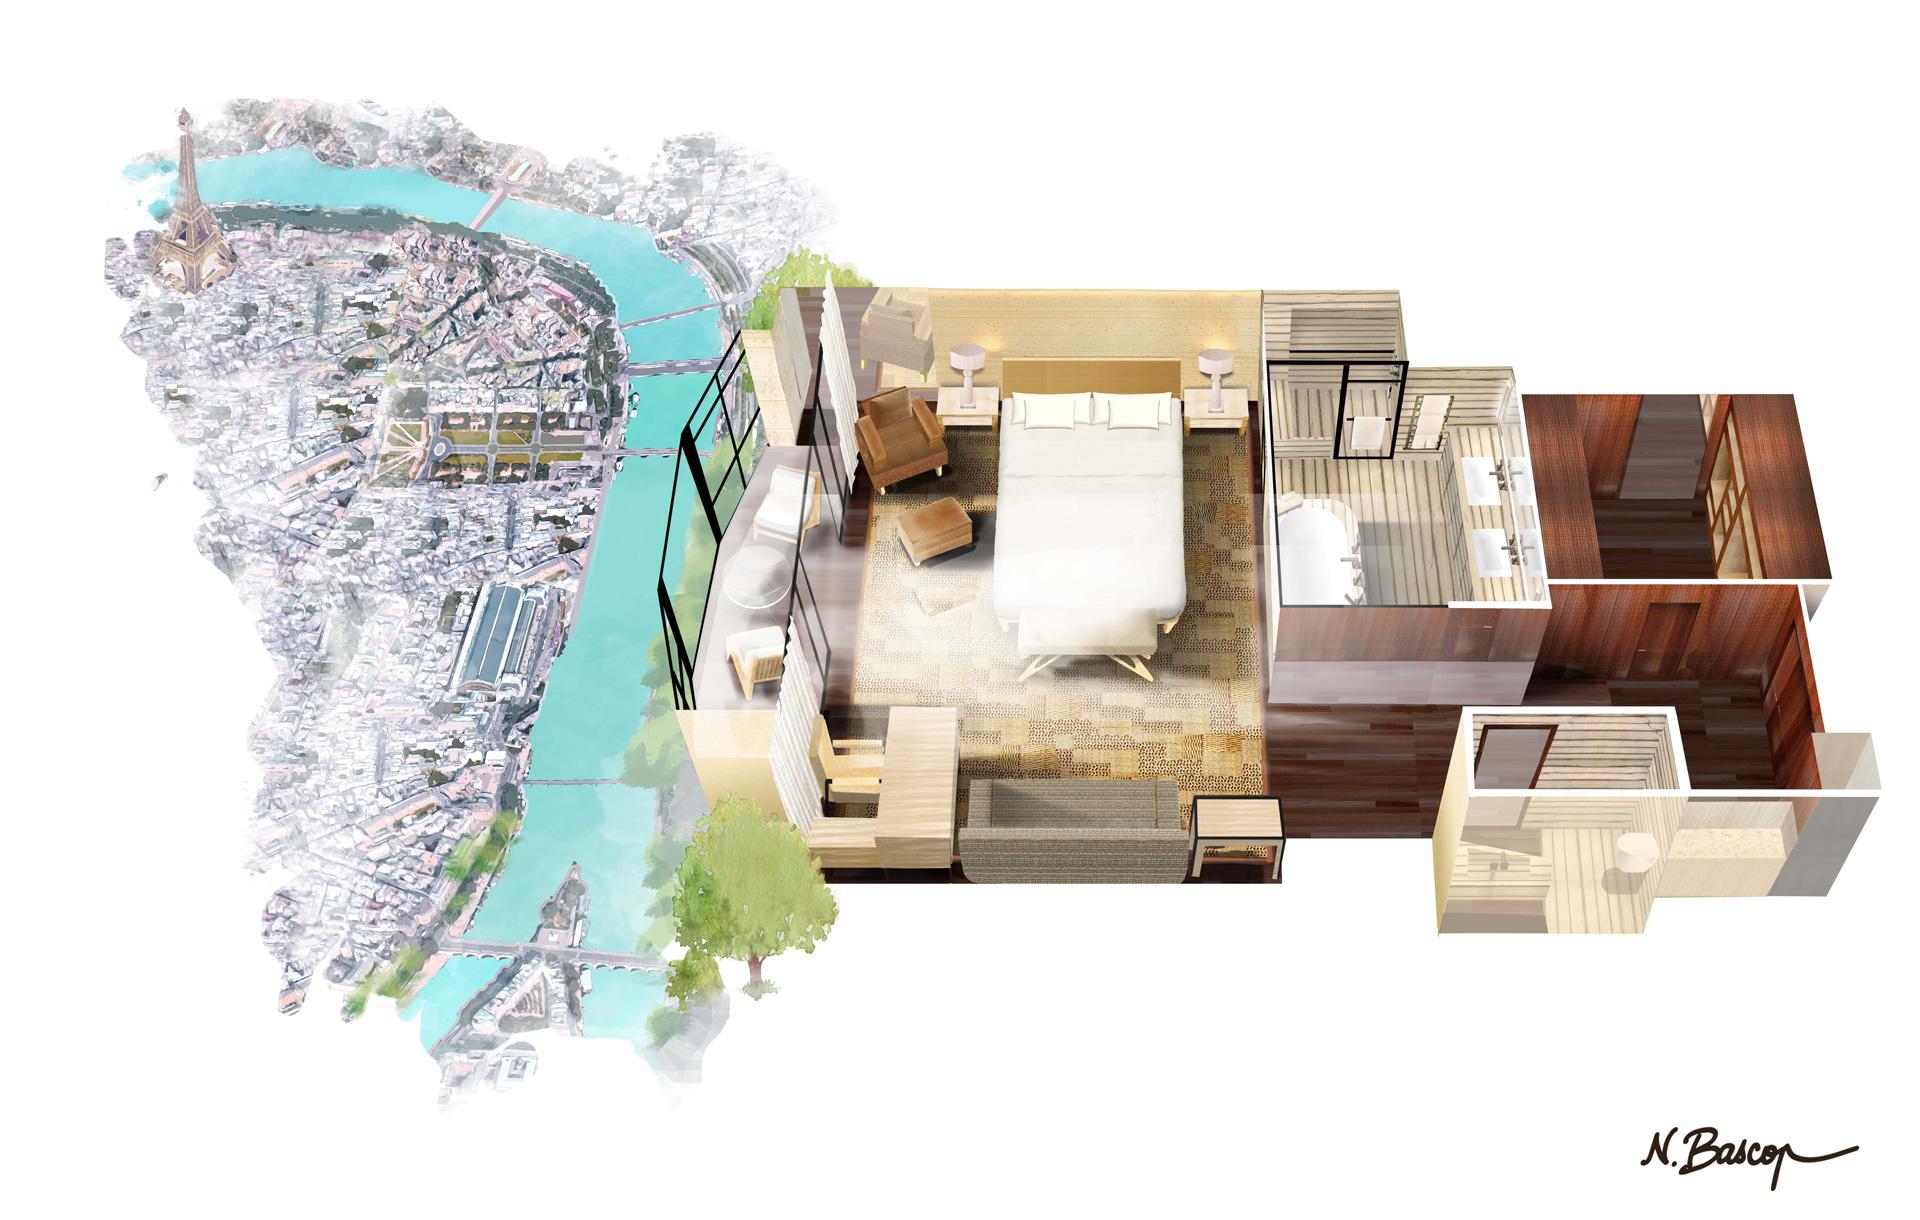 Cheval Blanc Paris, Hotel de luxe France, Seine Junior Suite, Casol